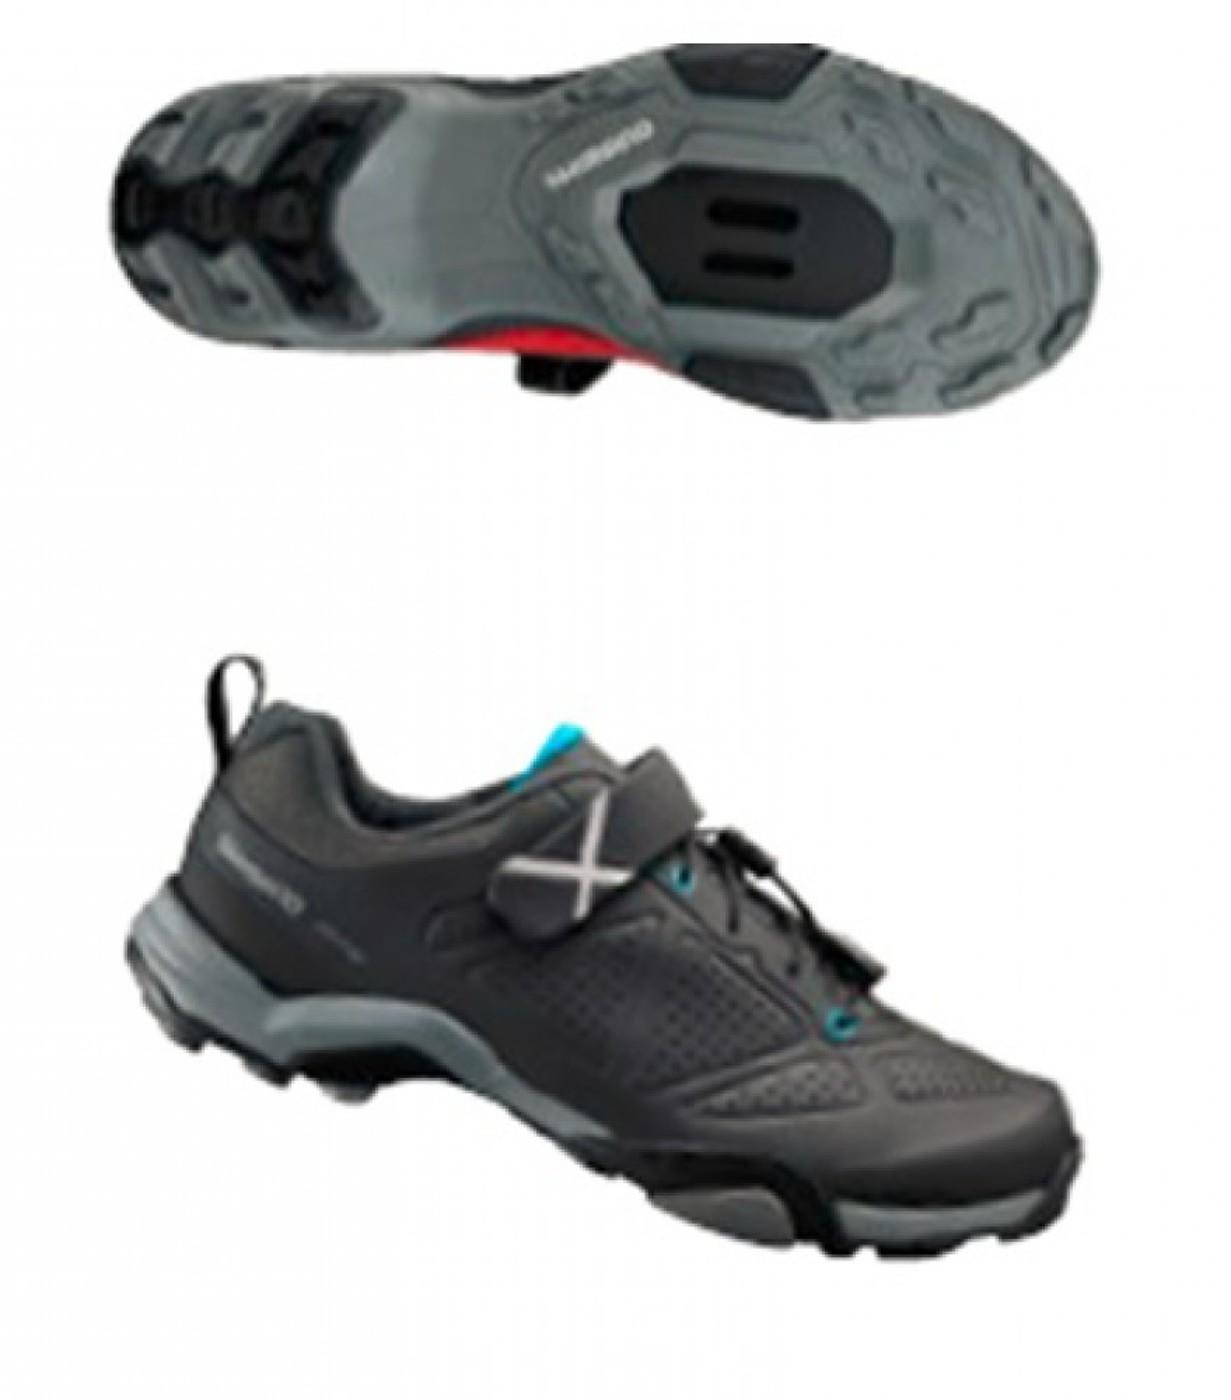 SHIMANO MTB-Schuh SHMT5L - Herren